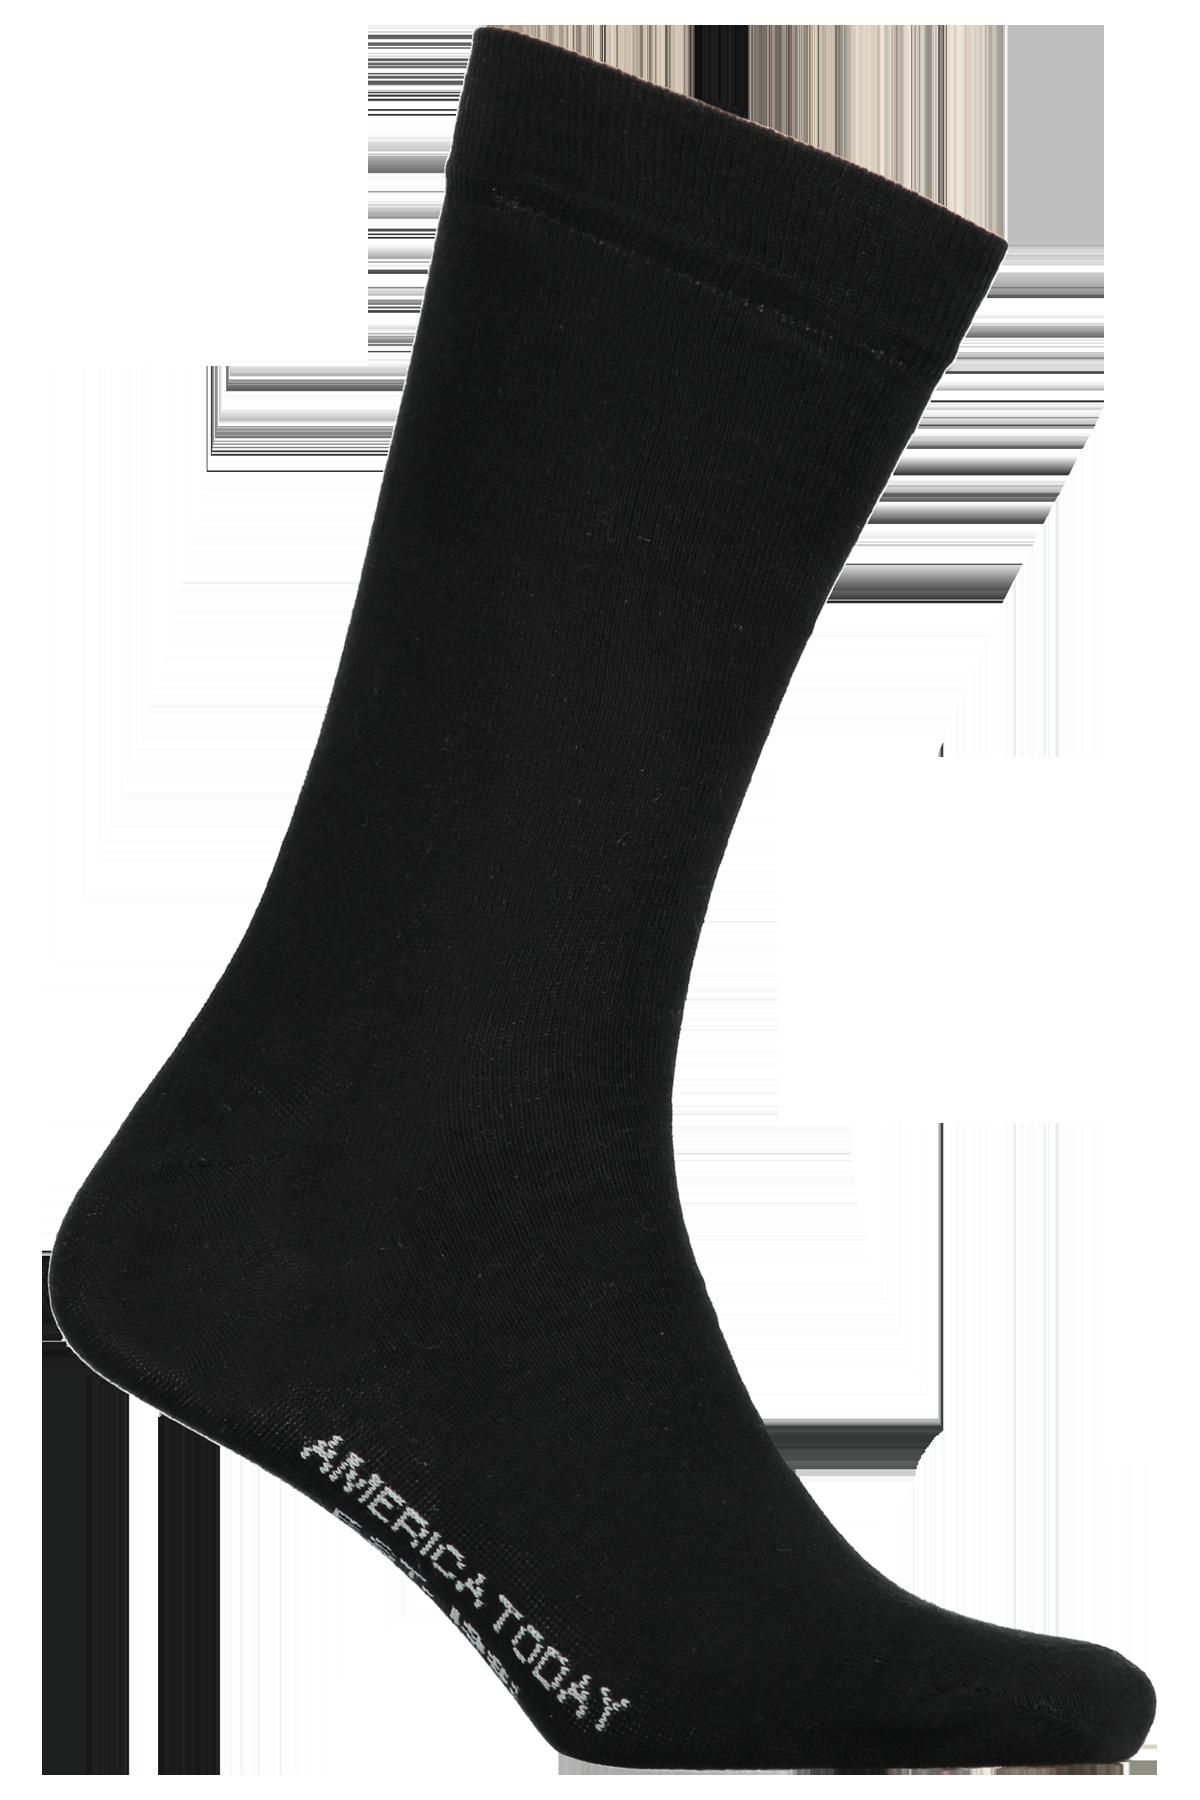 Socken Uni socks